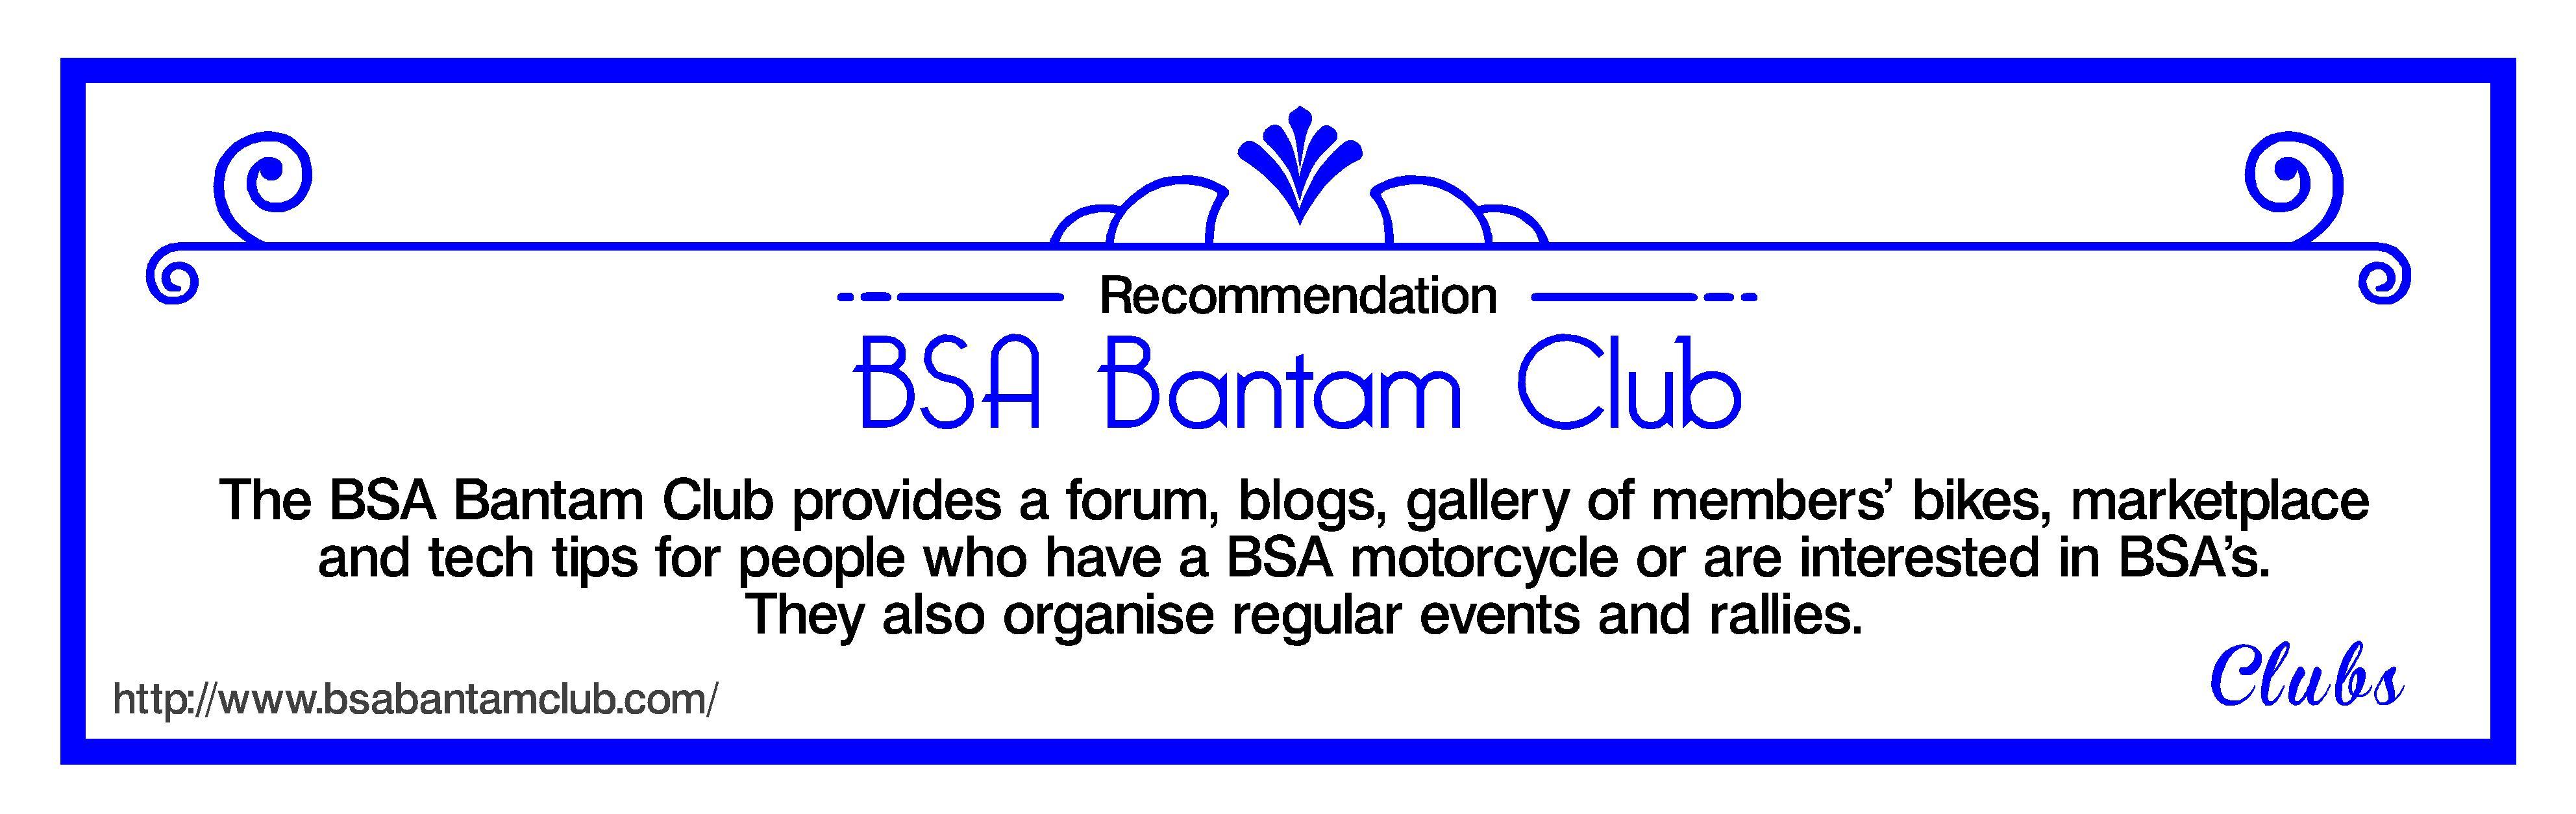 Bantam Club